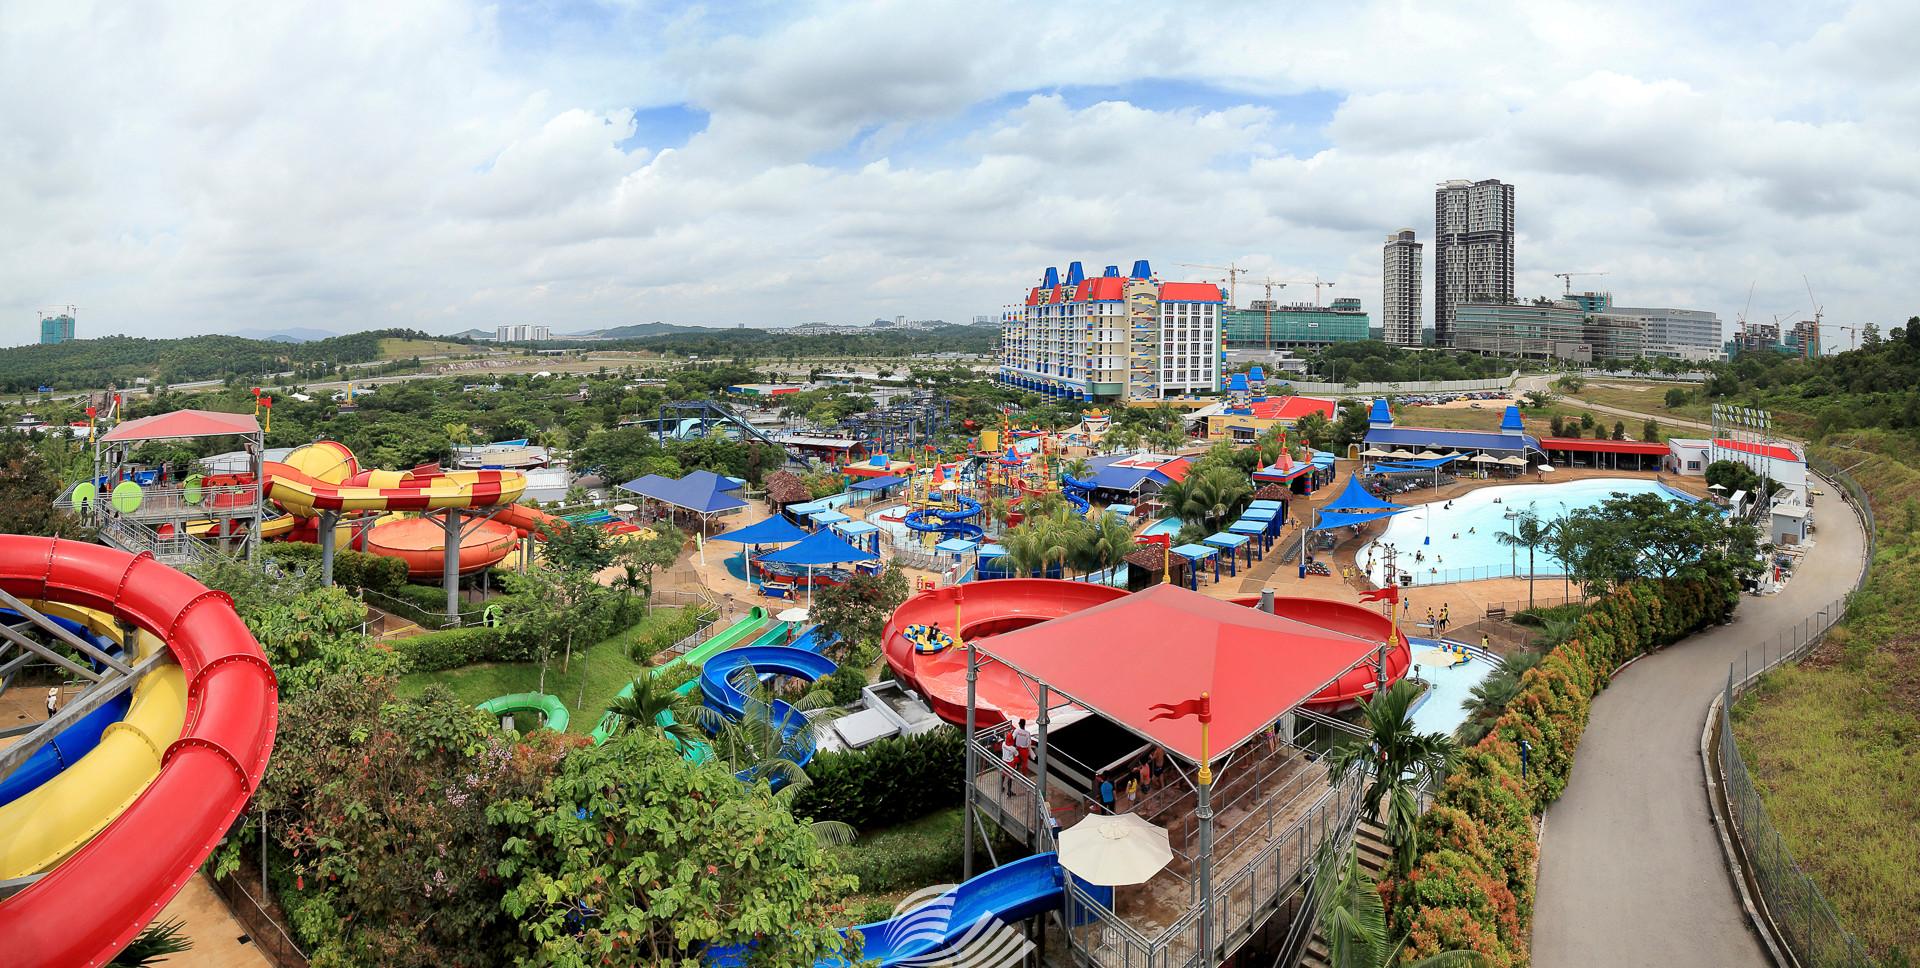 Legoland Johor_IMG_2683a pano 06 v2.jpg